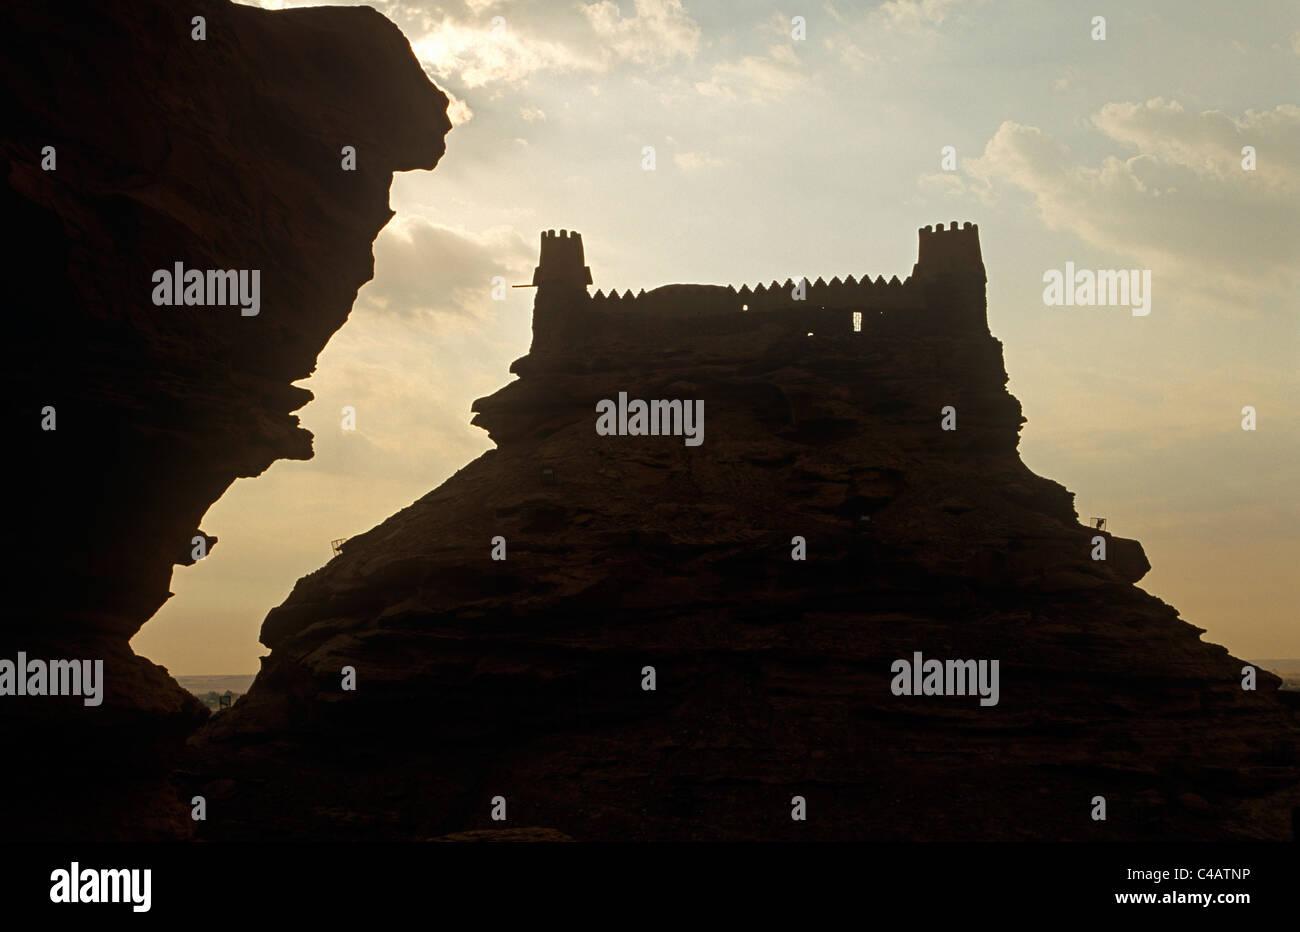 Saudi Arabia, Jouf, Sakaka. Brilliant sunshine silhouettes the brooding outline of the 19th-century Zaabel Fort, Stock Photo